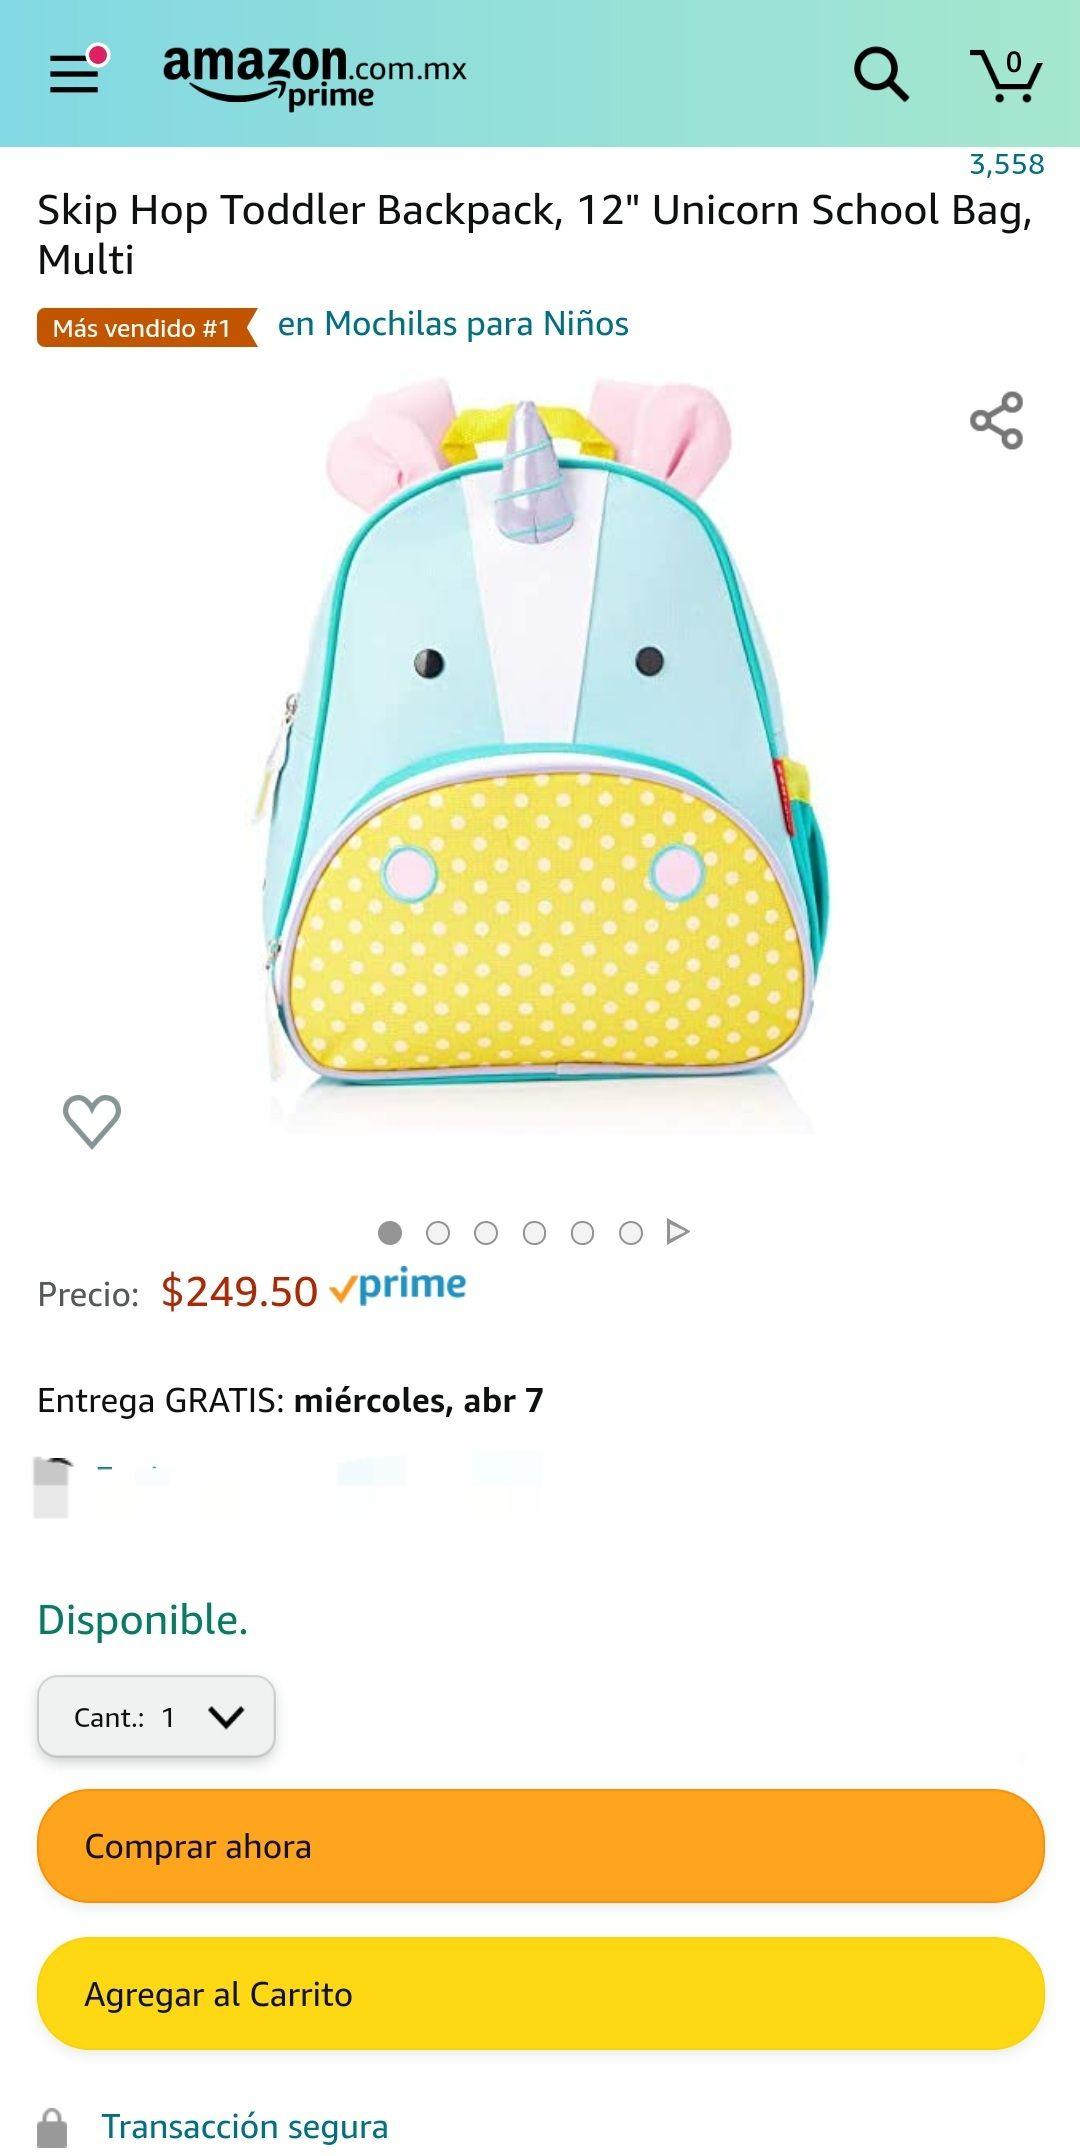 "Amazon: mochila Skip Hop Toddler Backpack, 12"" Unicorn School Baf"